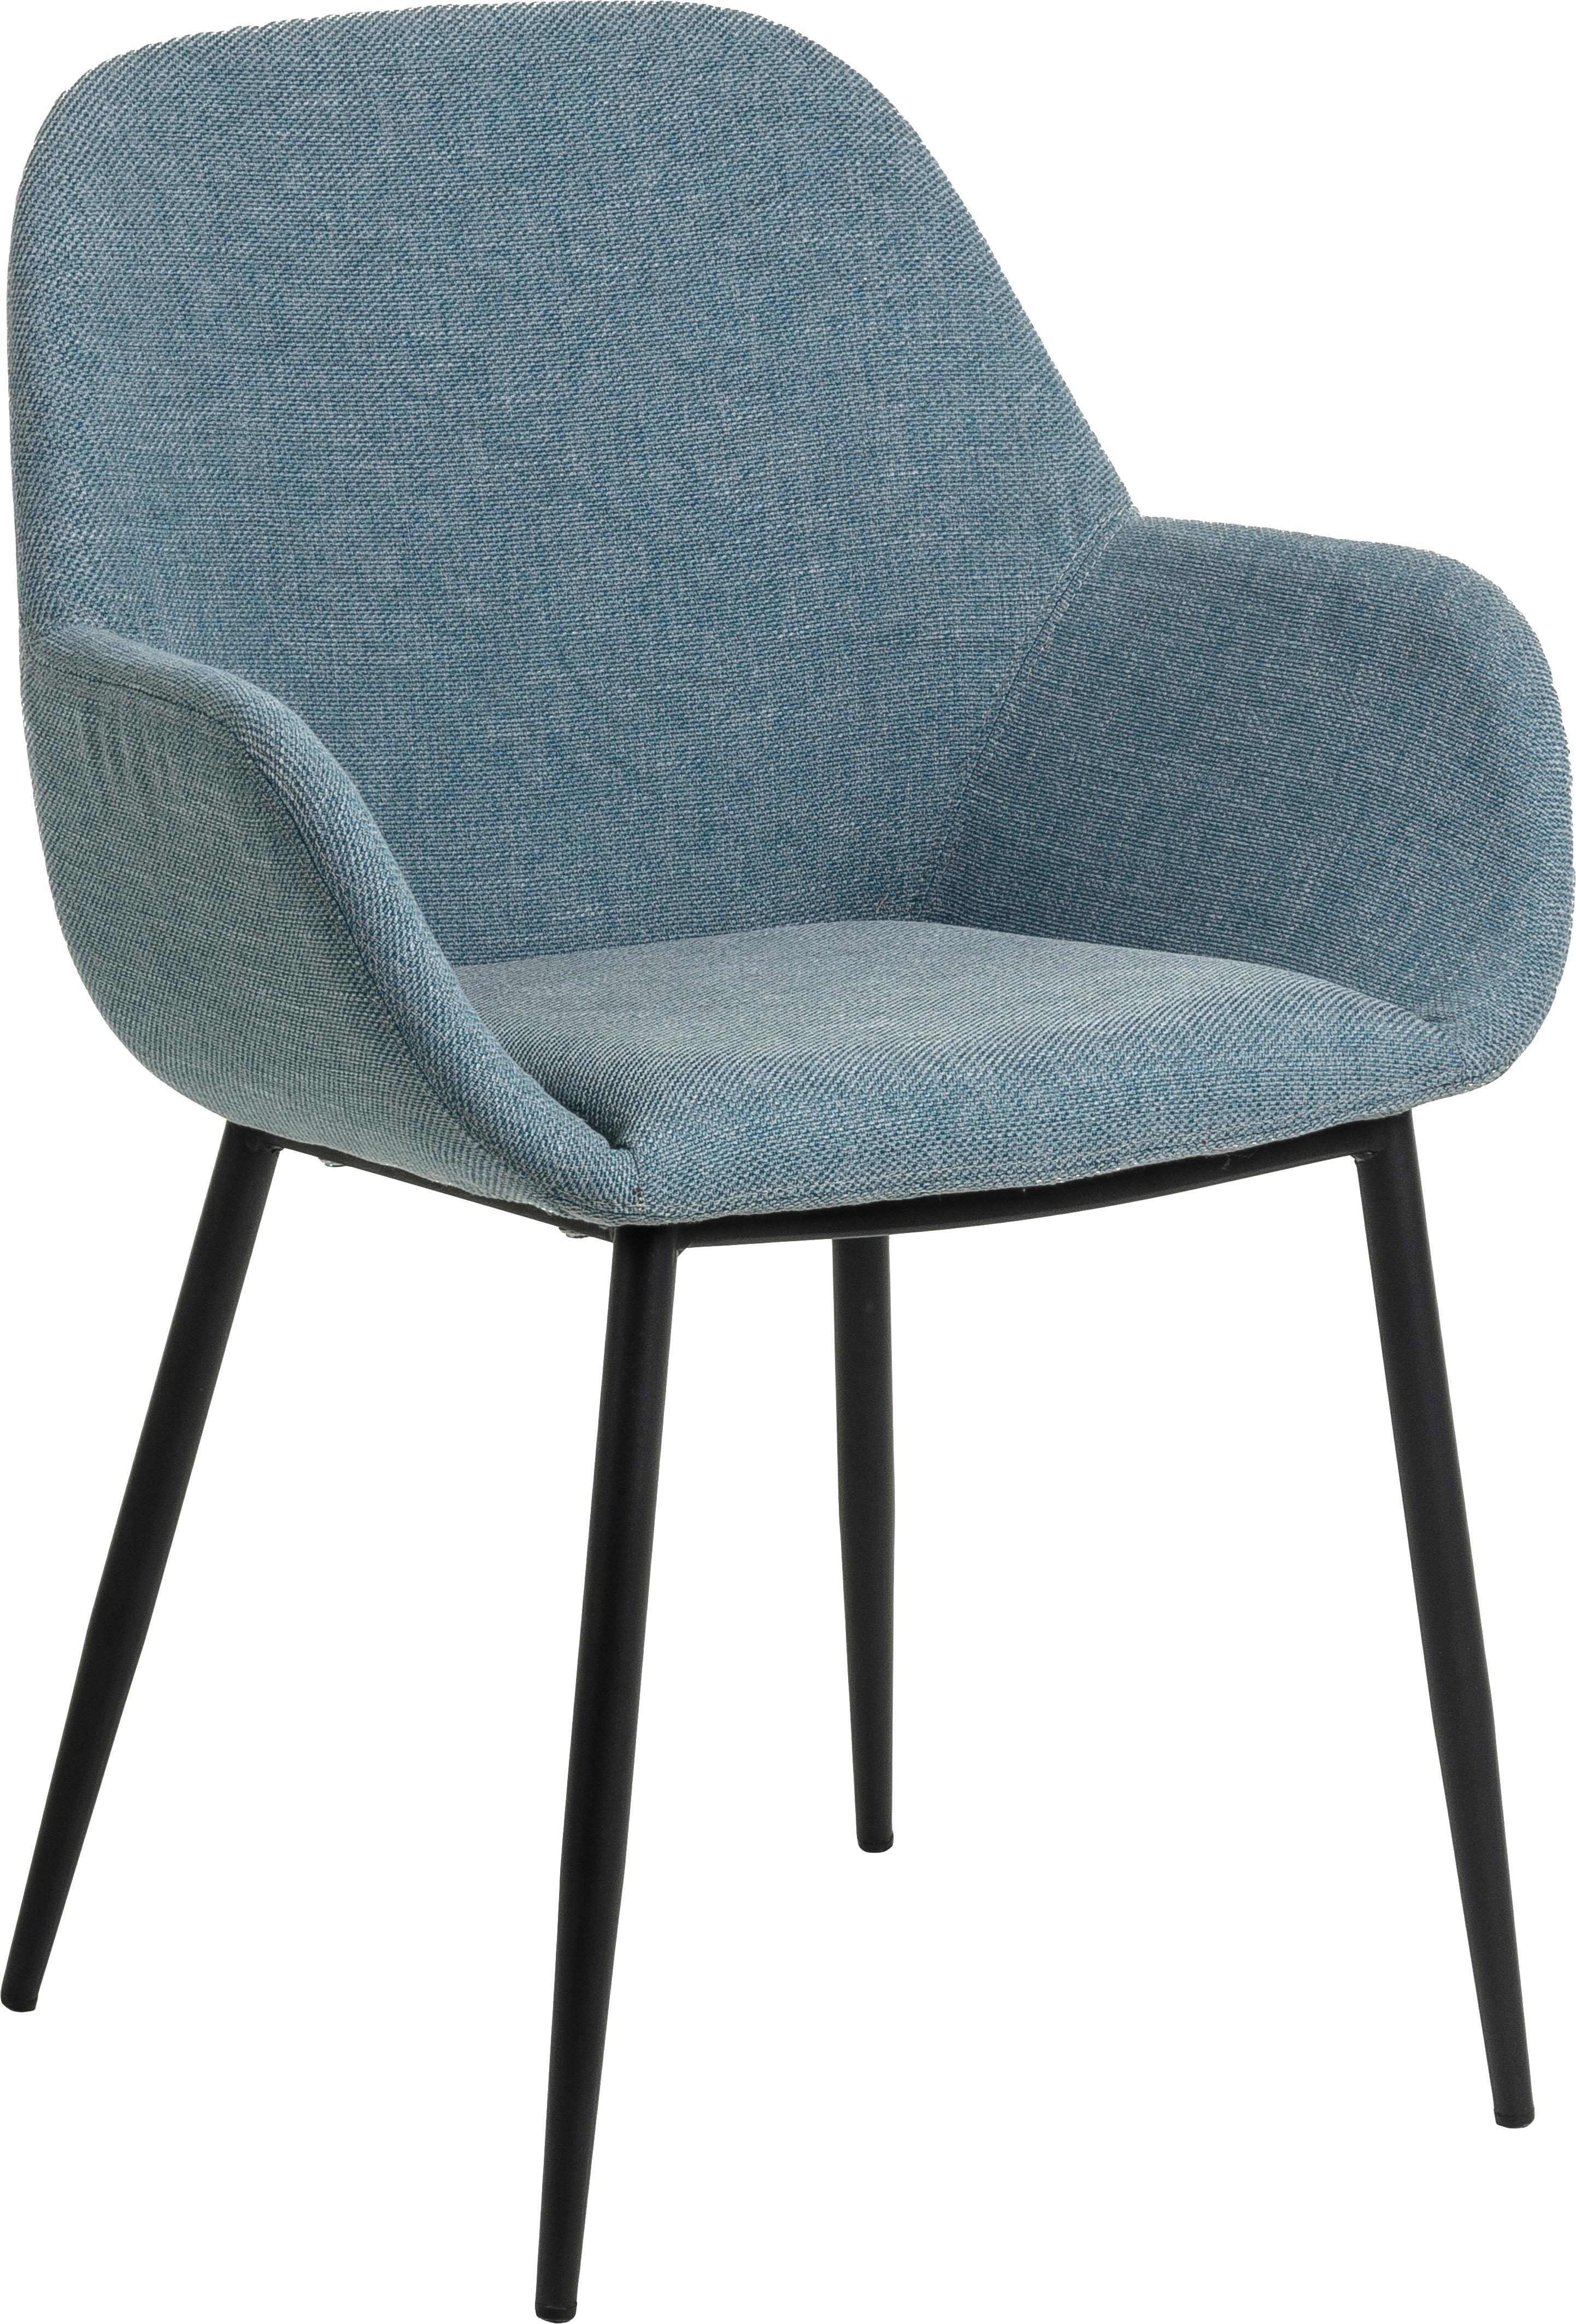 Sedia con braccioli Kona 2 pz, Rivestimento: poliestere 50.000 cicli d, Gambe: metallo verniciato, Tessuto blu, Larg. 59 x Alt. 56 cm